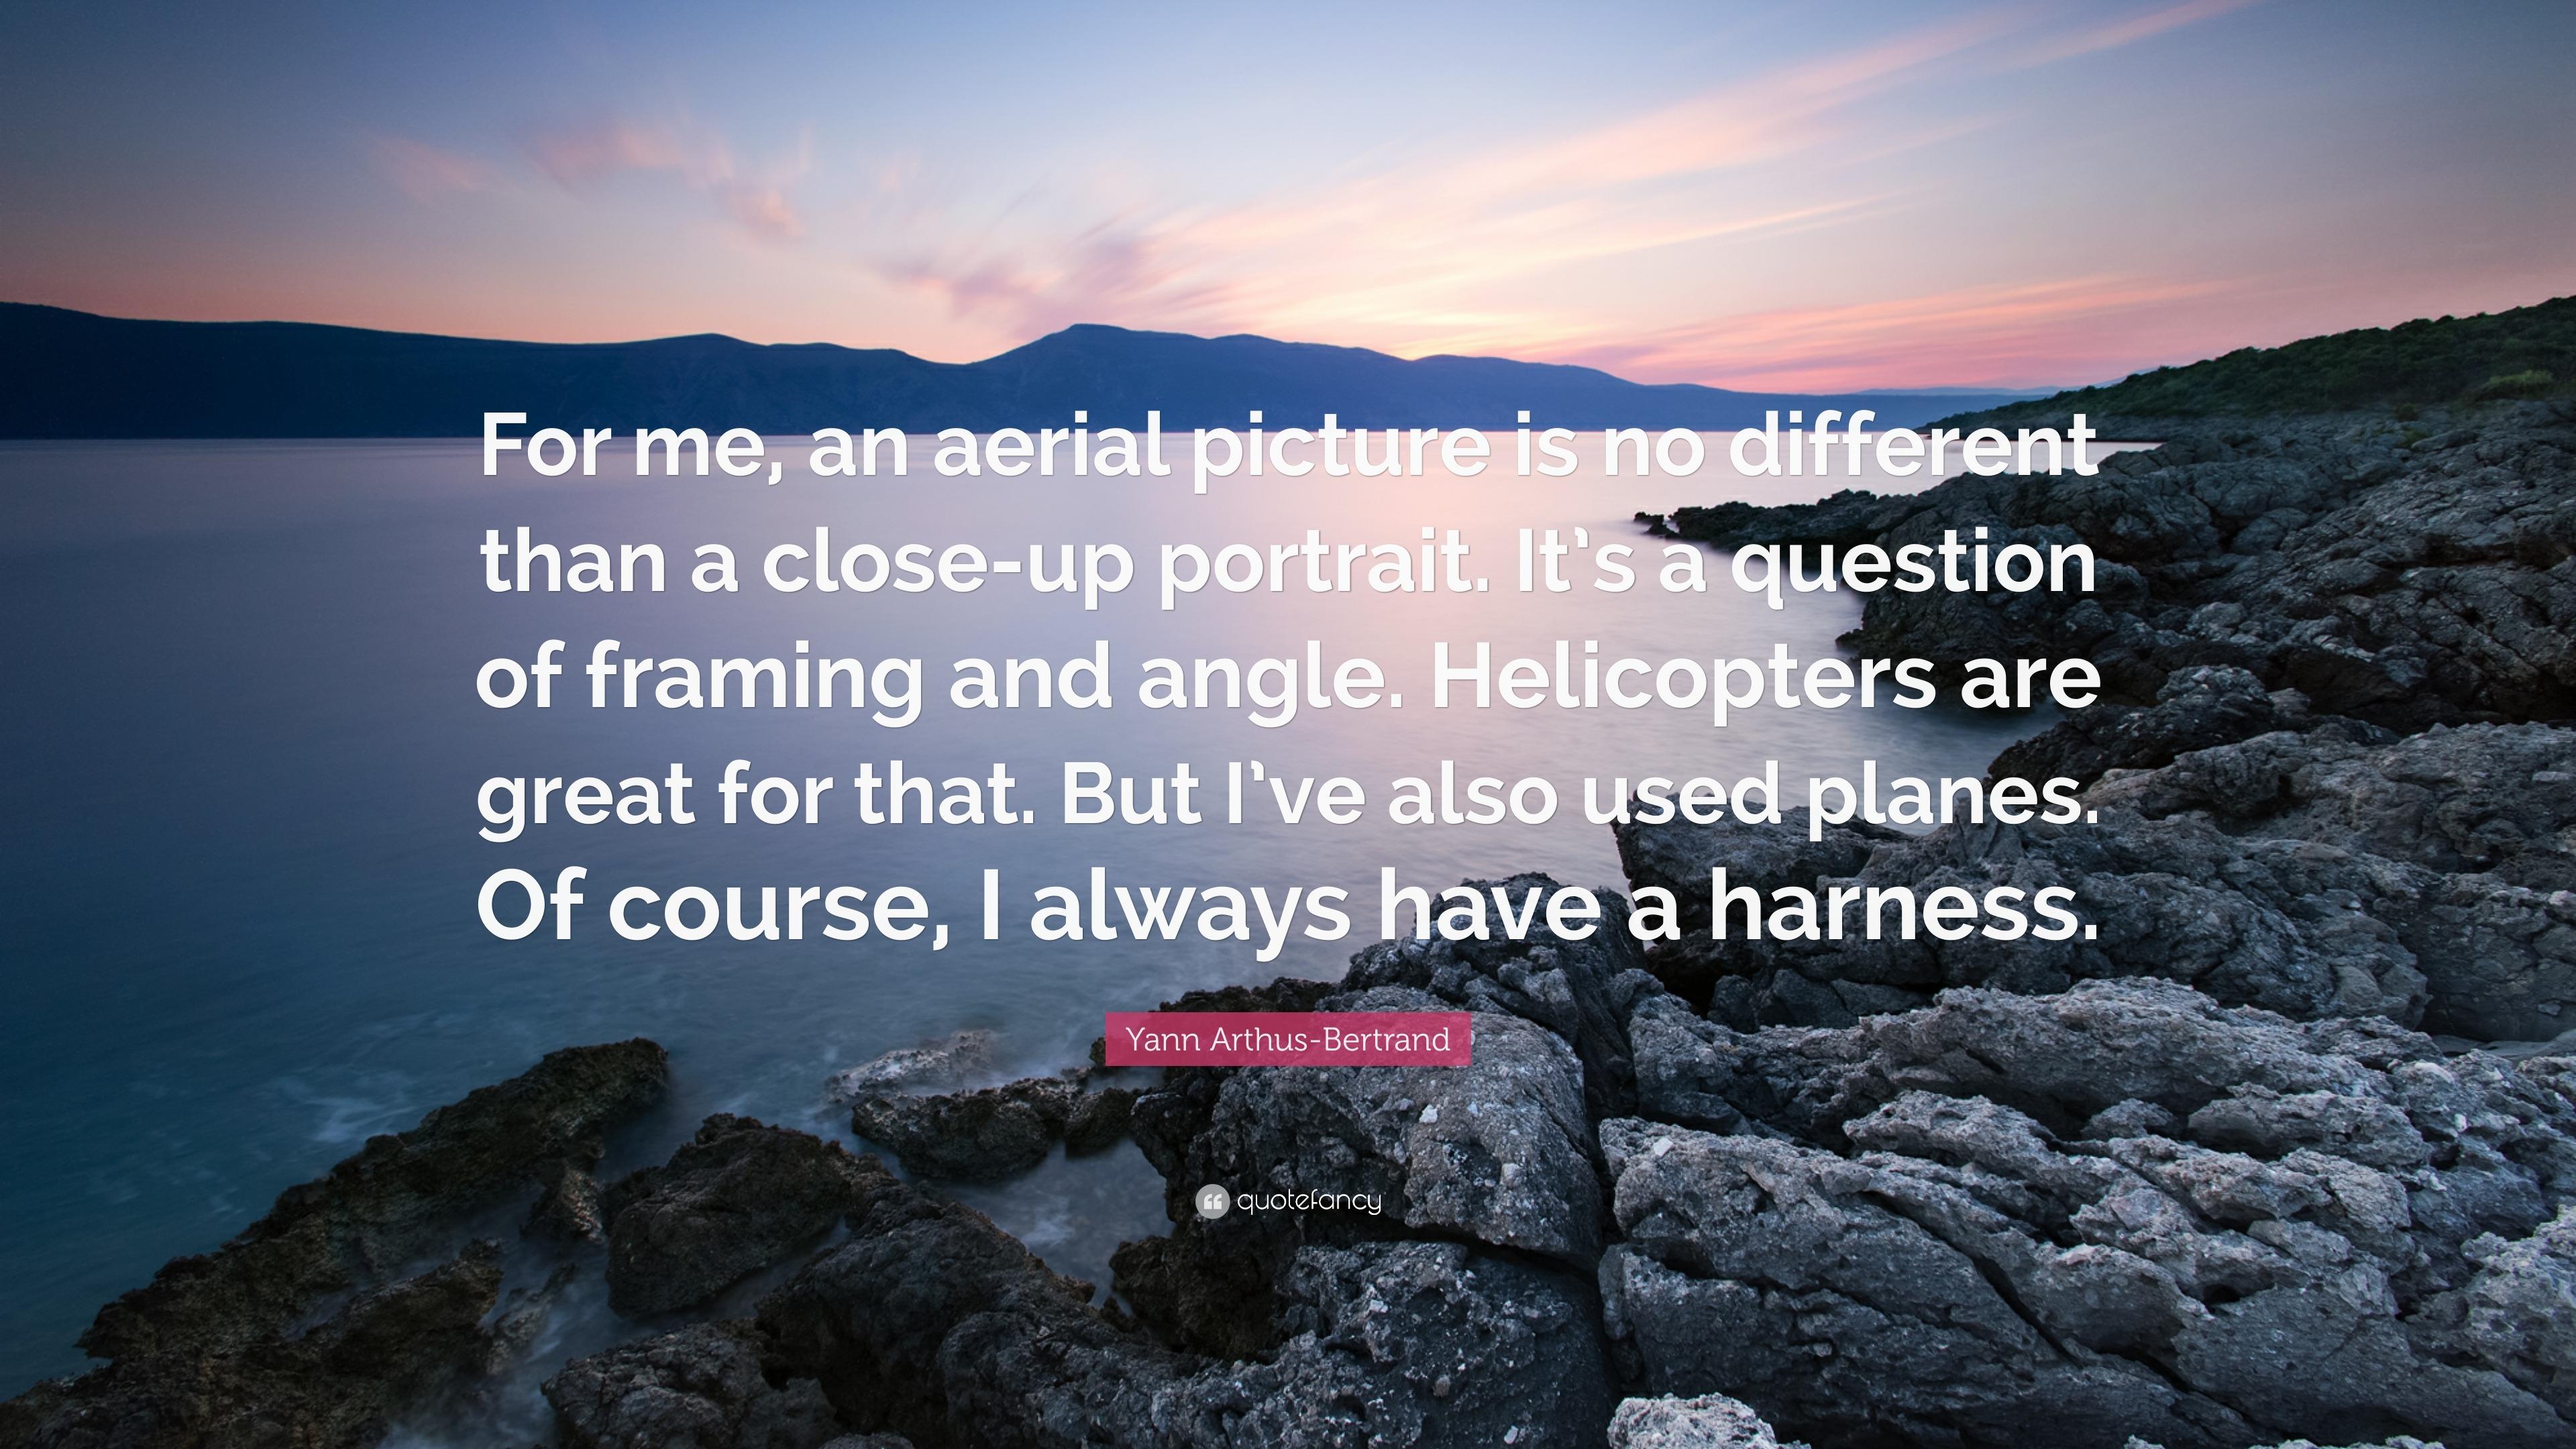 Yann Arthus Bertrand Quotes 21 Wallpapers Quotefancy